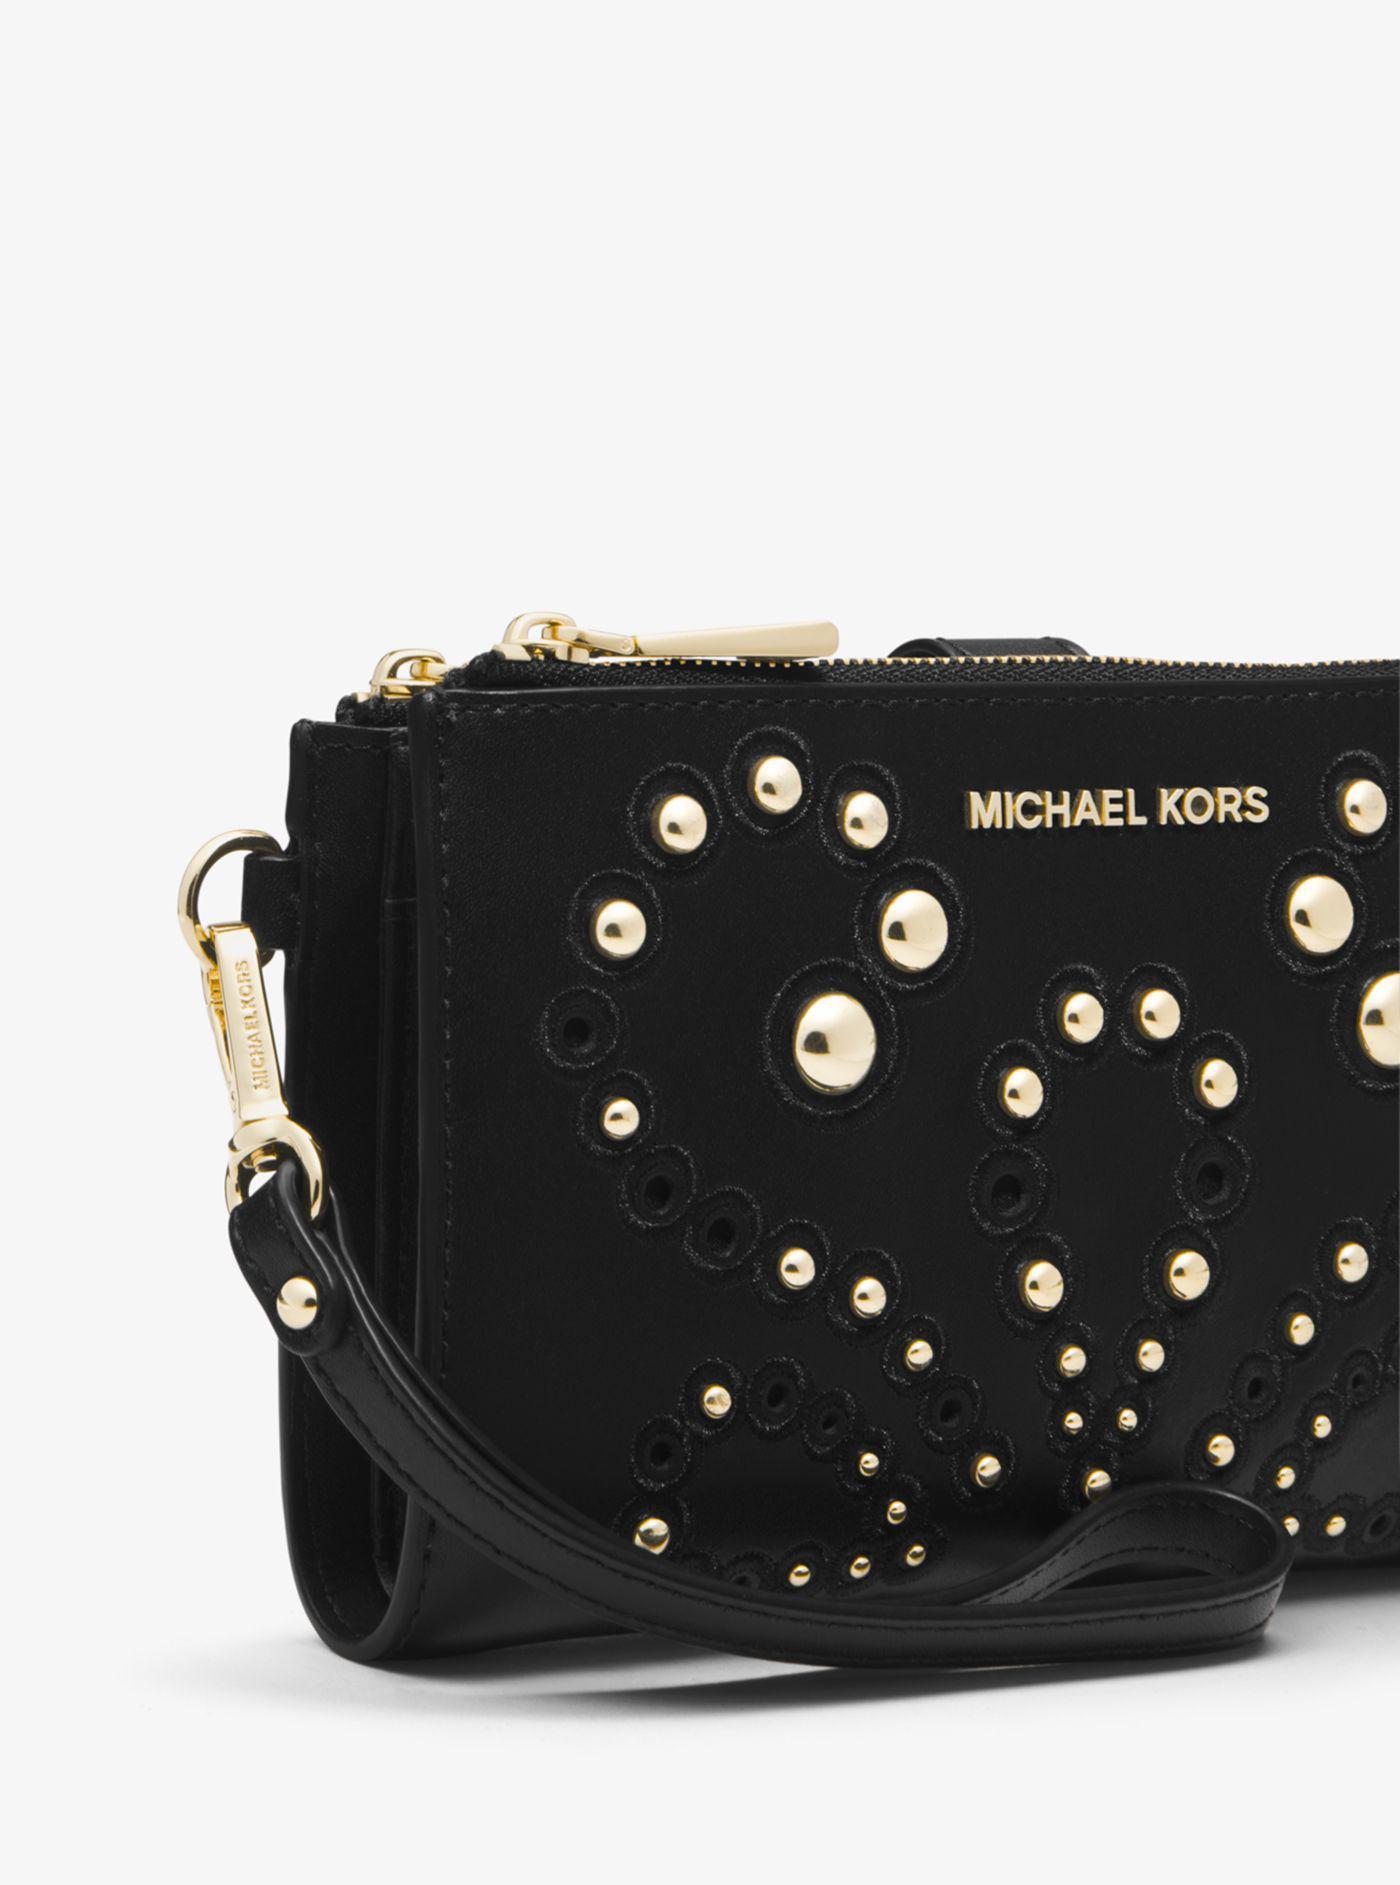 d35a0e7895f1 Michael Kors Adele Embellished Leather Smartphone Wallet in Black - Lyst